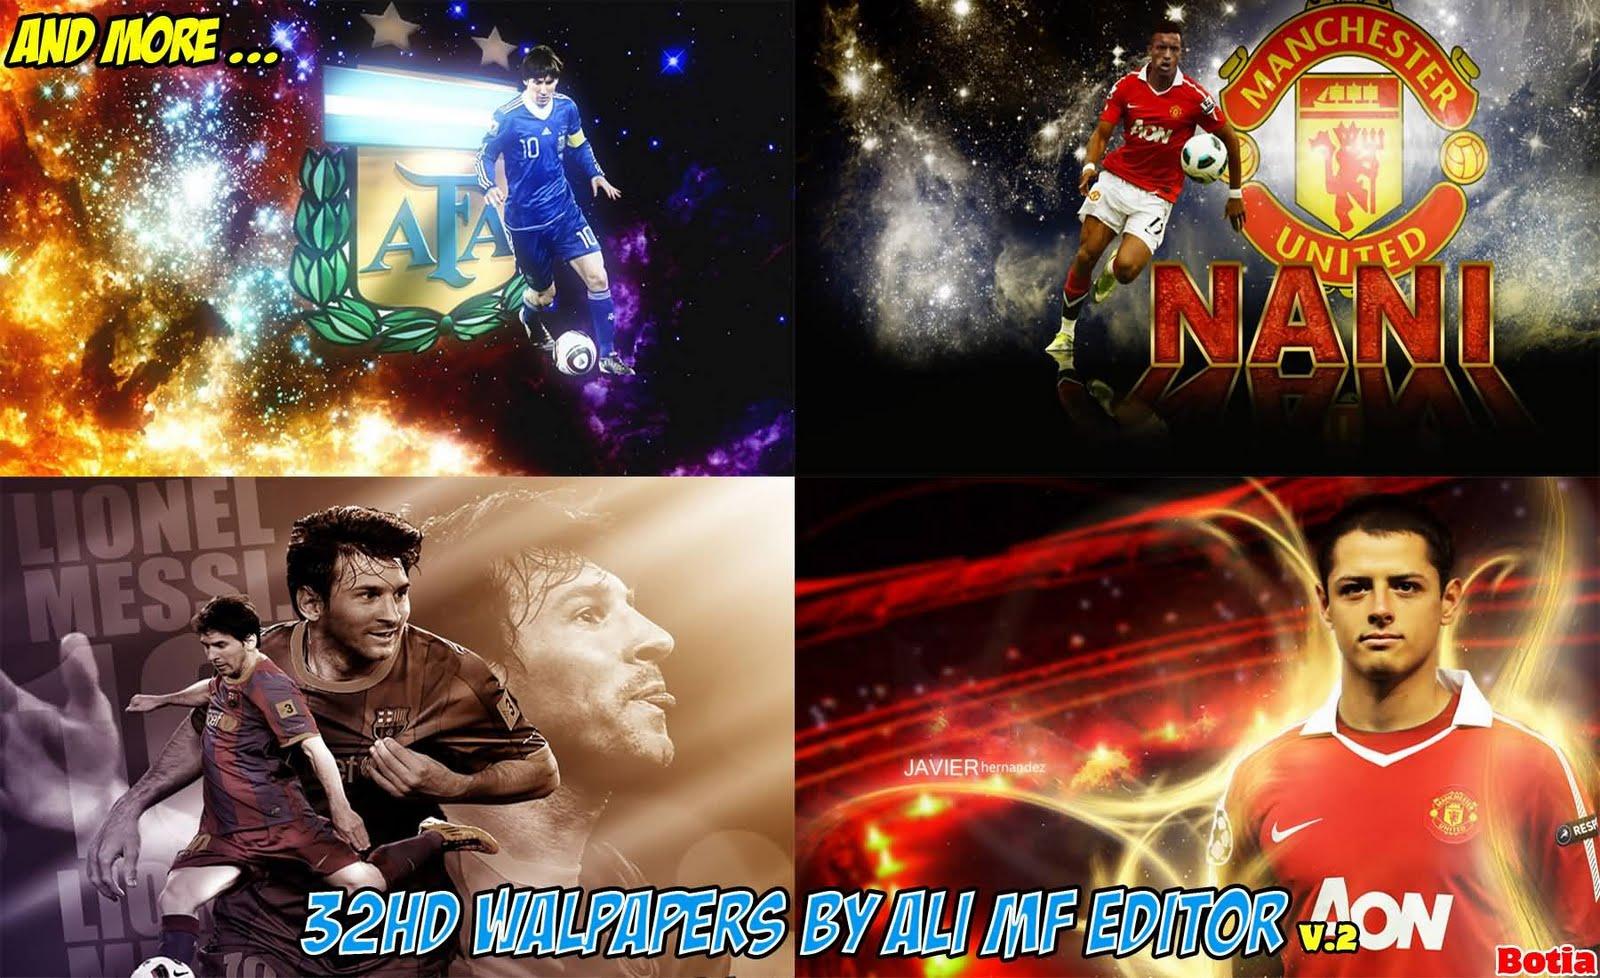 http://4.bp.blogspot.com/-cJUBsRvqdnM/TdRps3KxvlI/AAAAAAAACSU/gcuYsACBTg4/s1600/32+HD+Wallpapers+v2.jpg